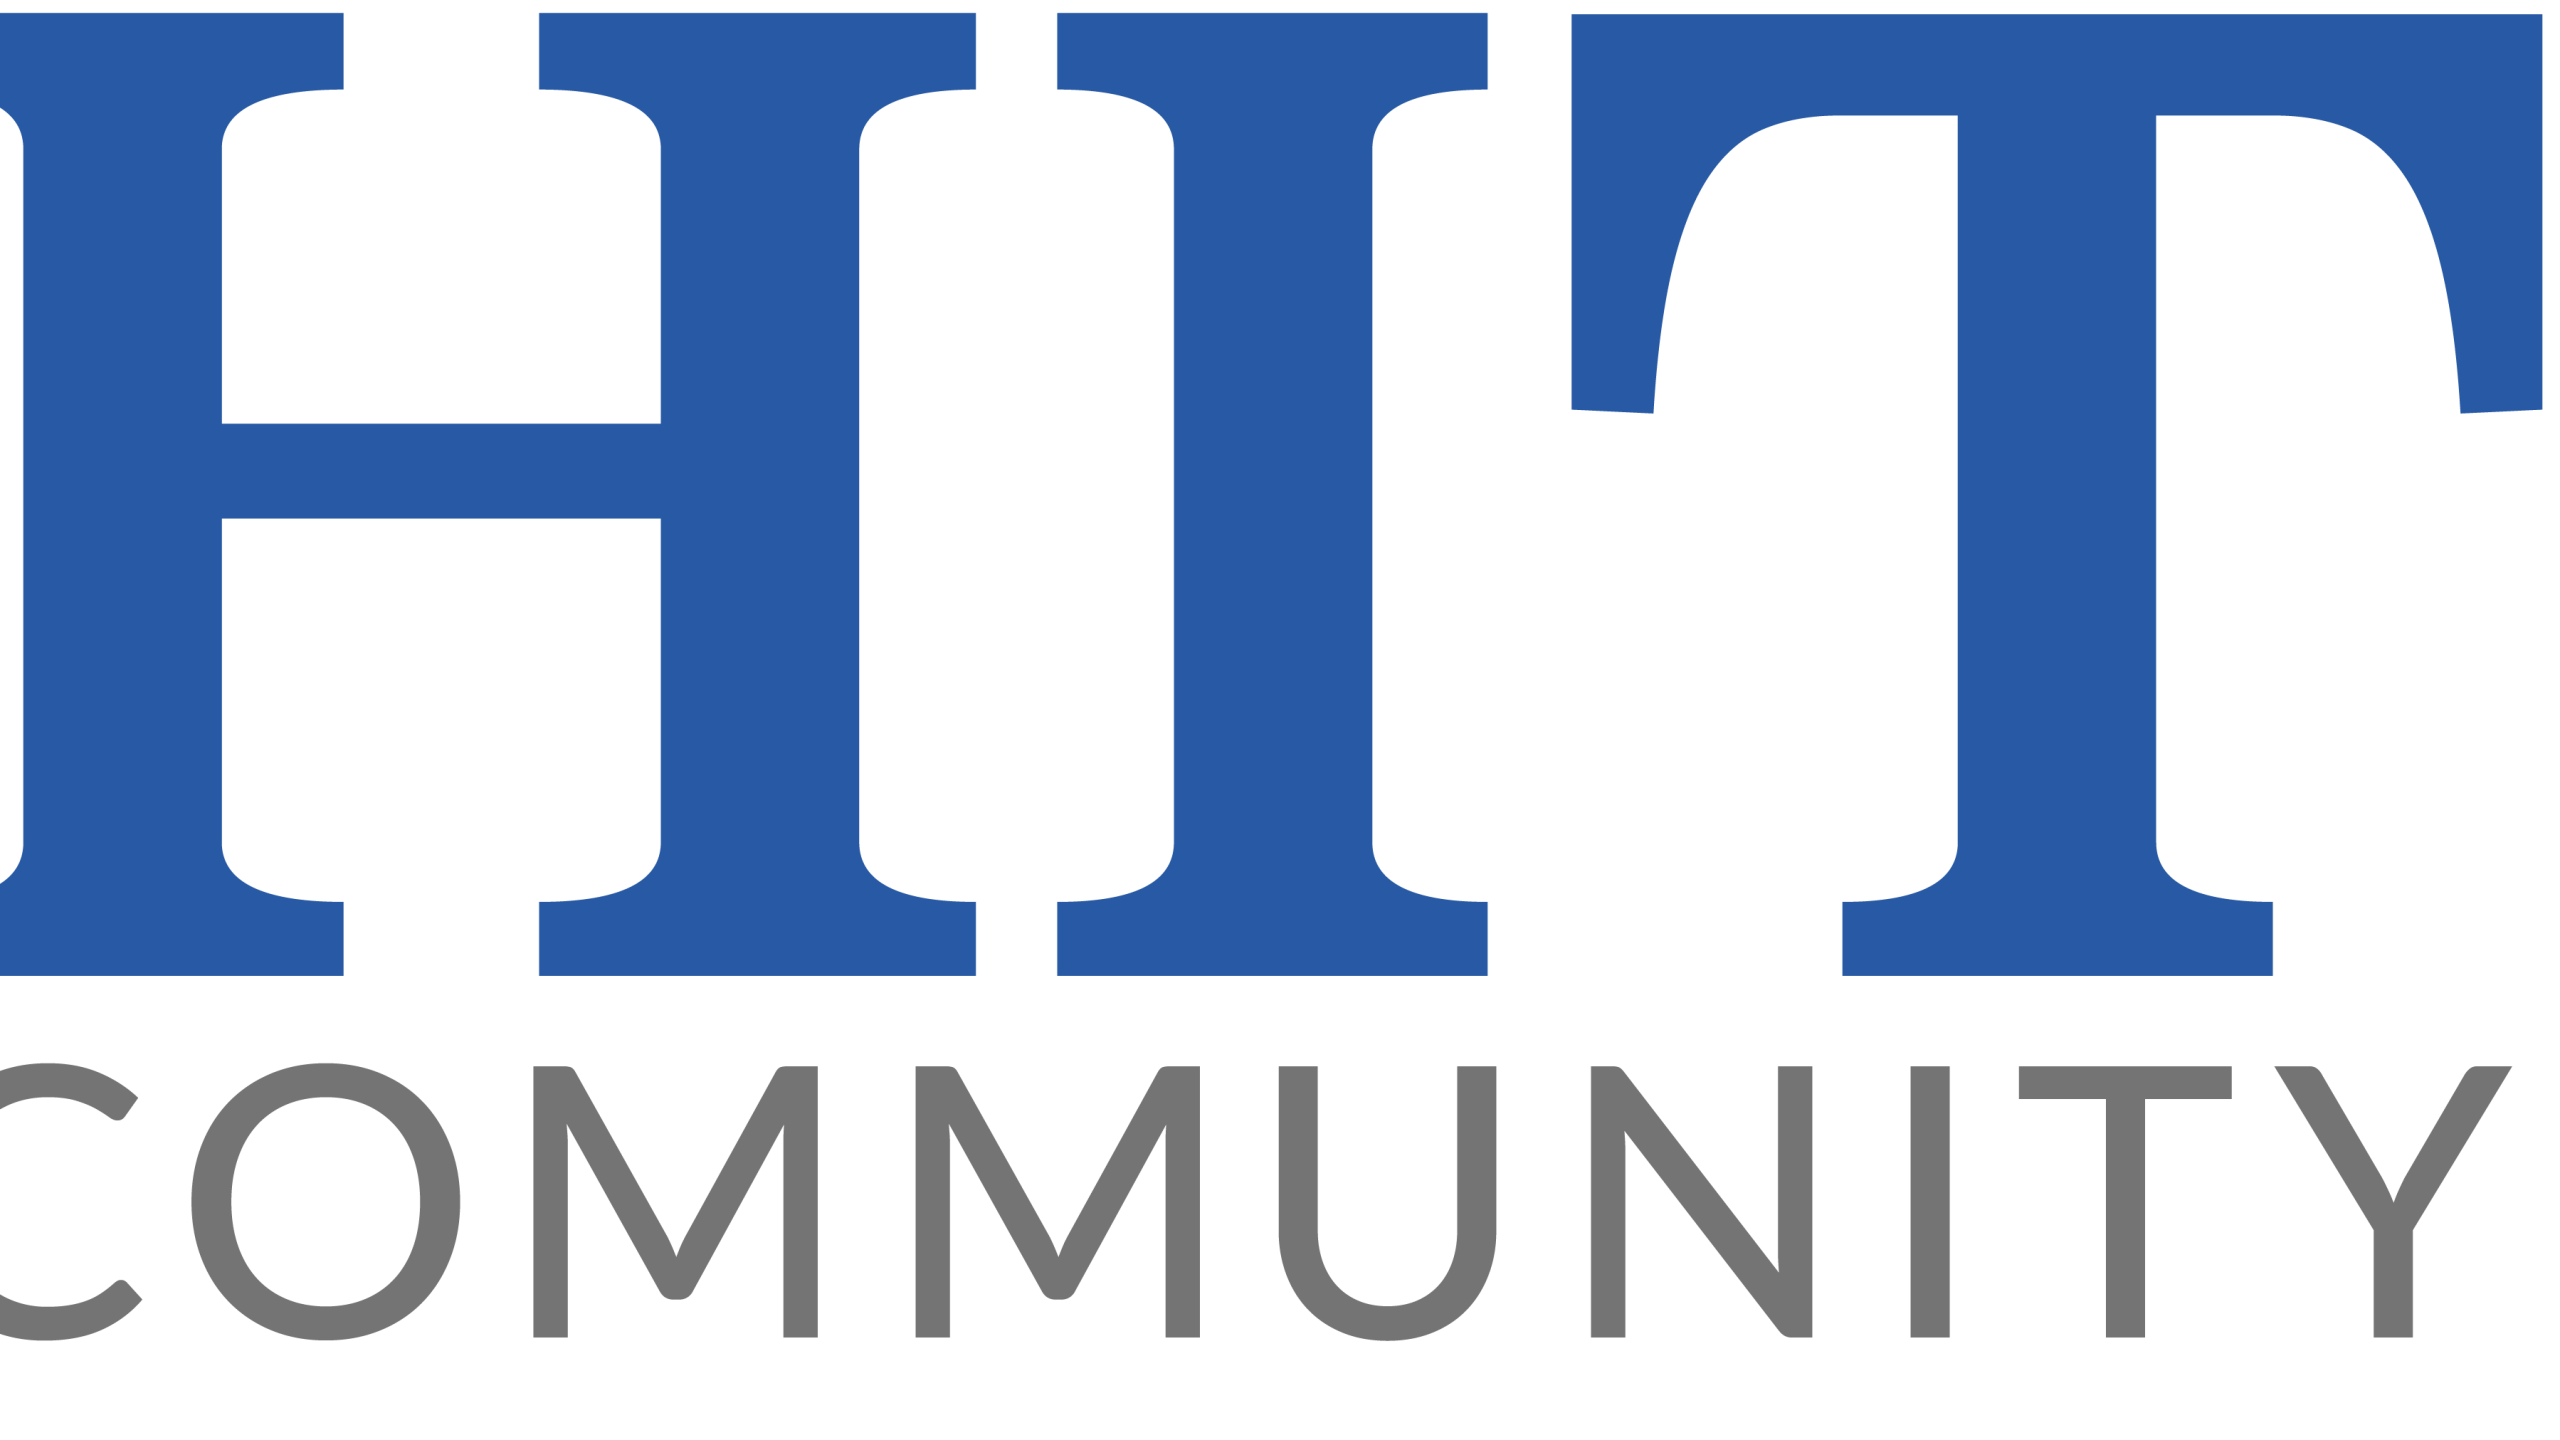 whitko_logo_community_schools_1533800420786.png